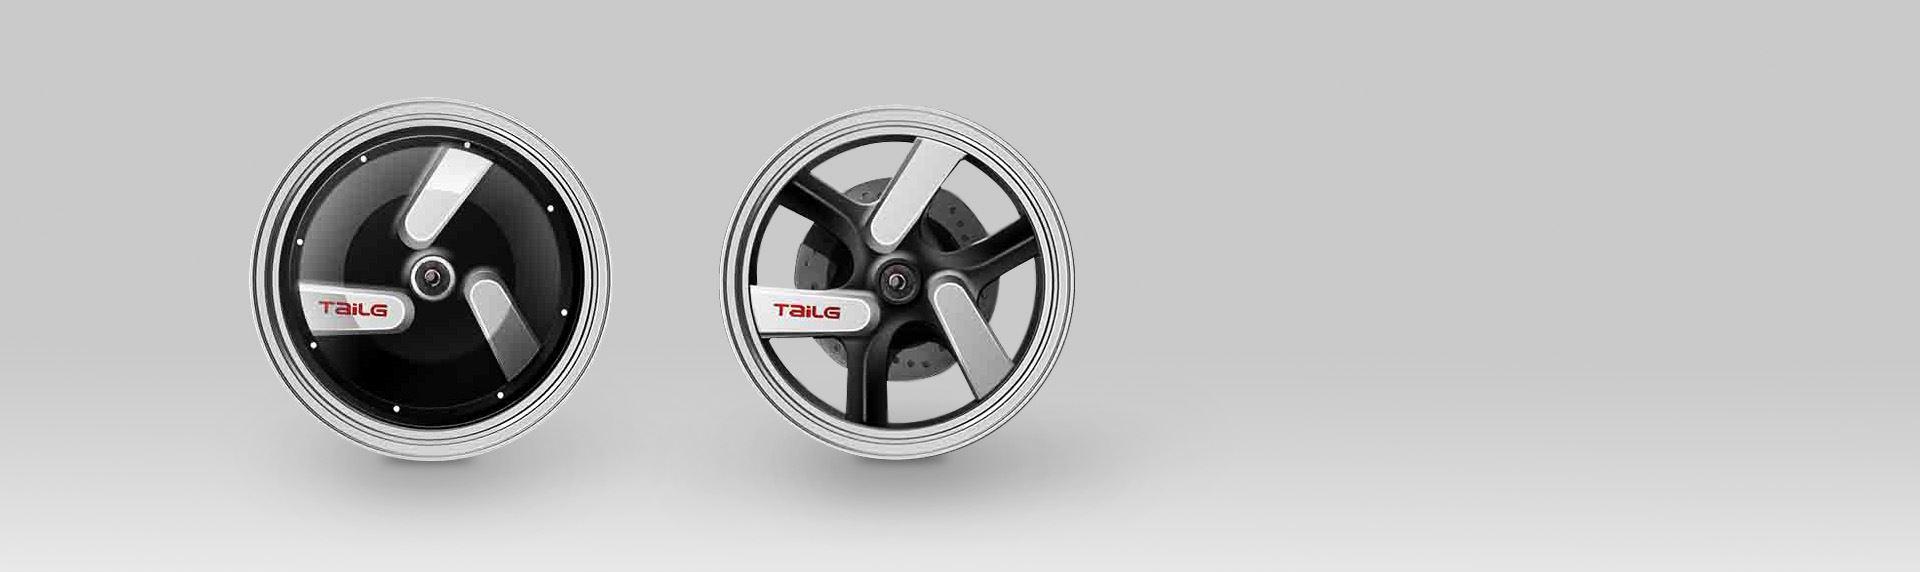 S10娱乐新闻-电动车机电轮毂